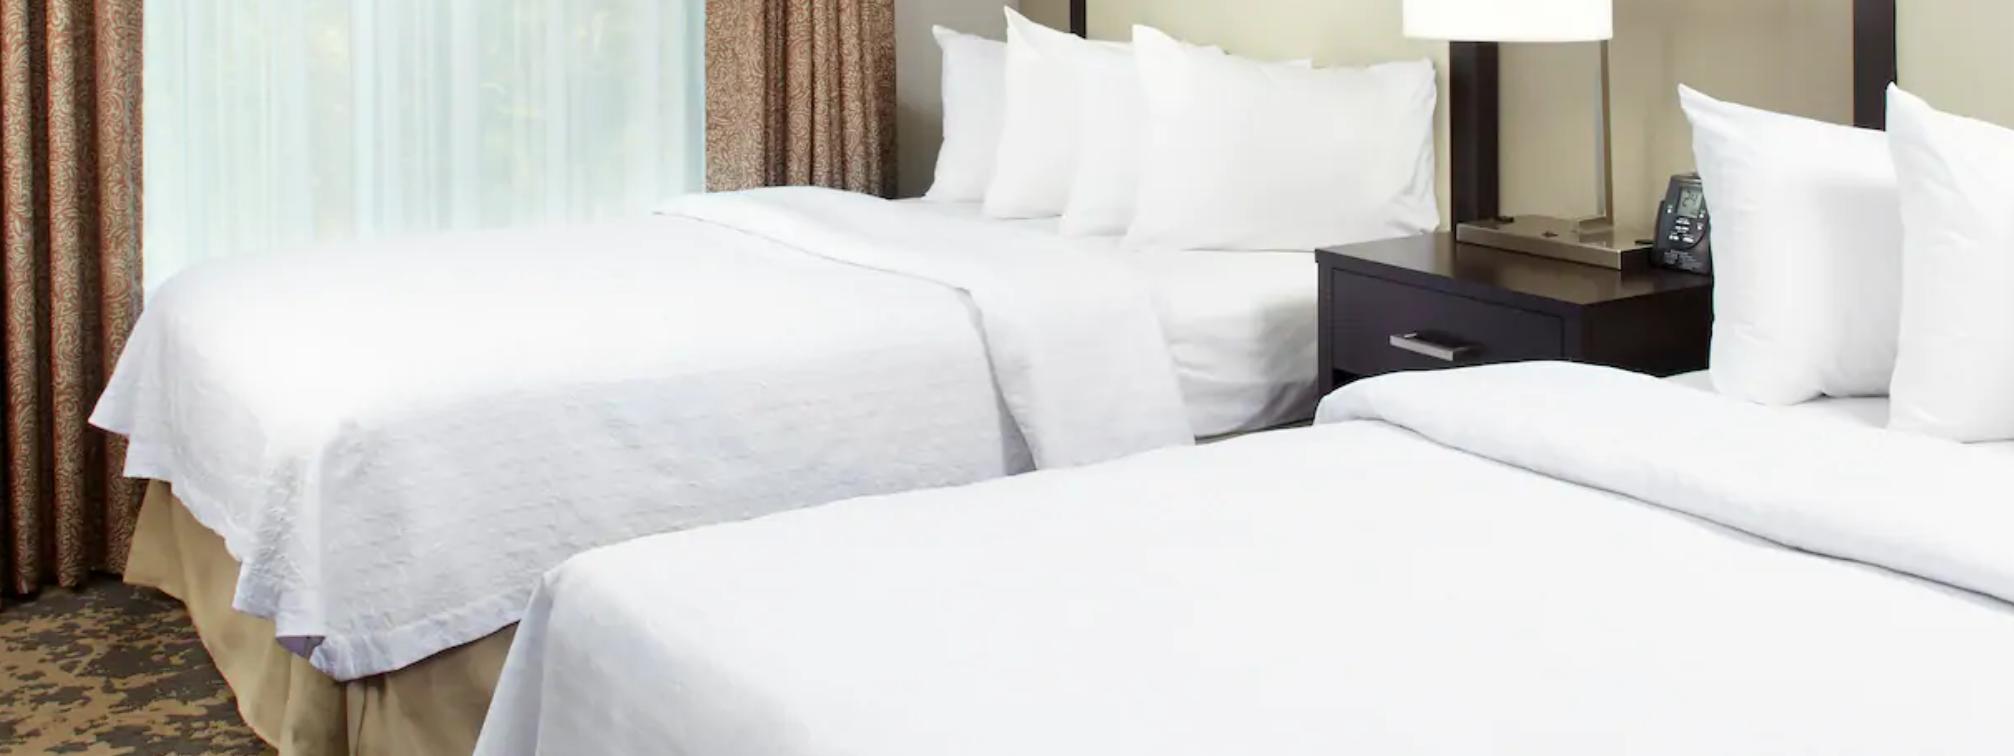 https://www.hotelsbyday.com/_data/default-hotel_image/3/18206/screenshot-2020-06-11-at-4-20-44-pm.png